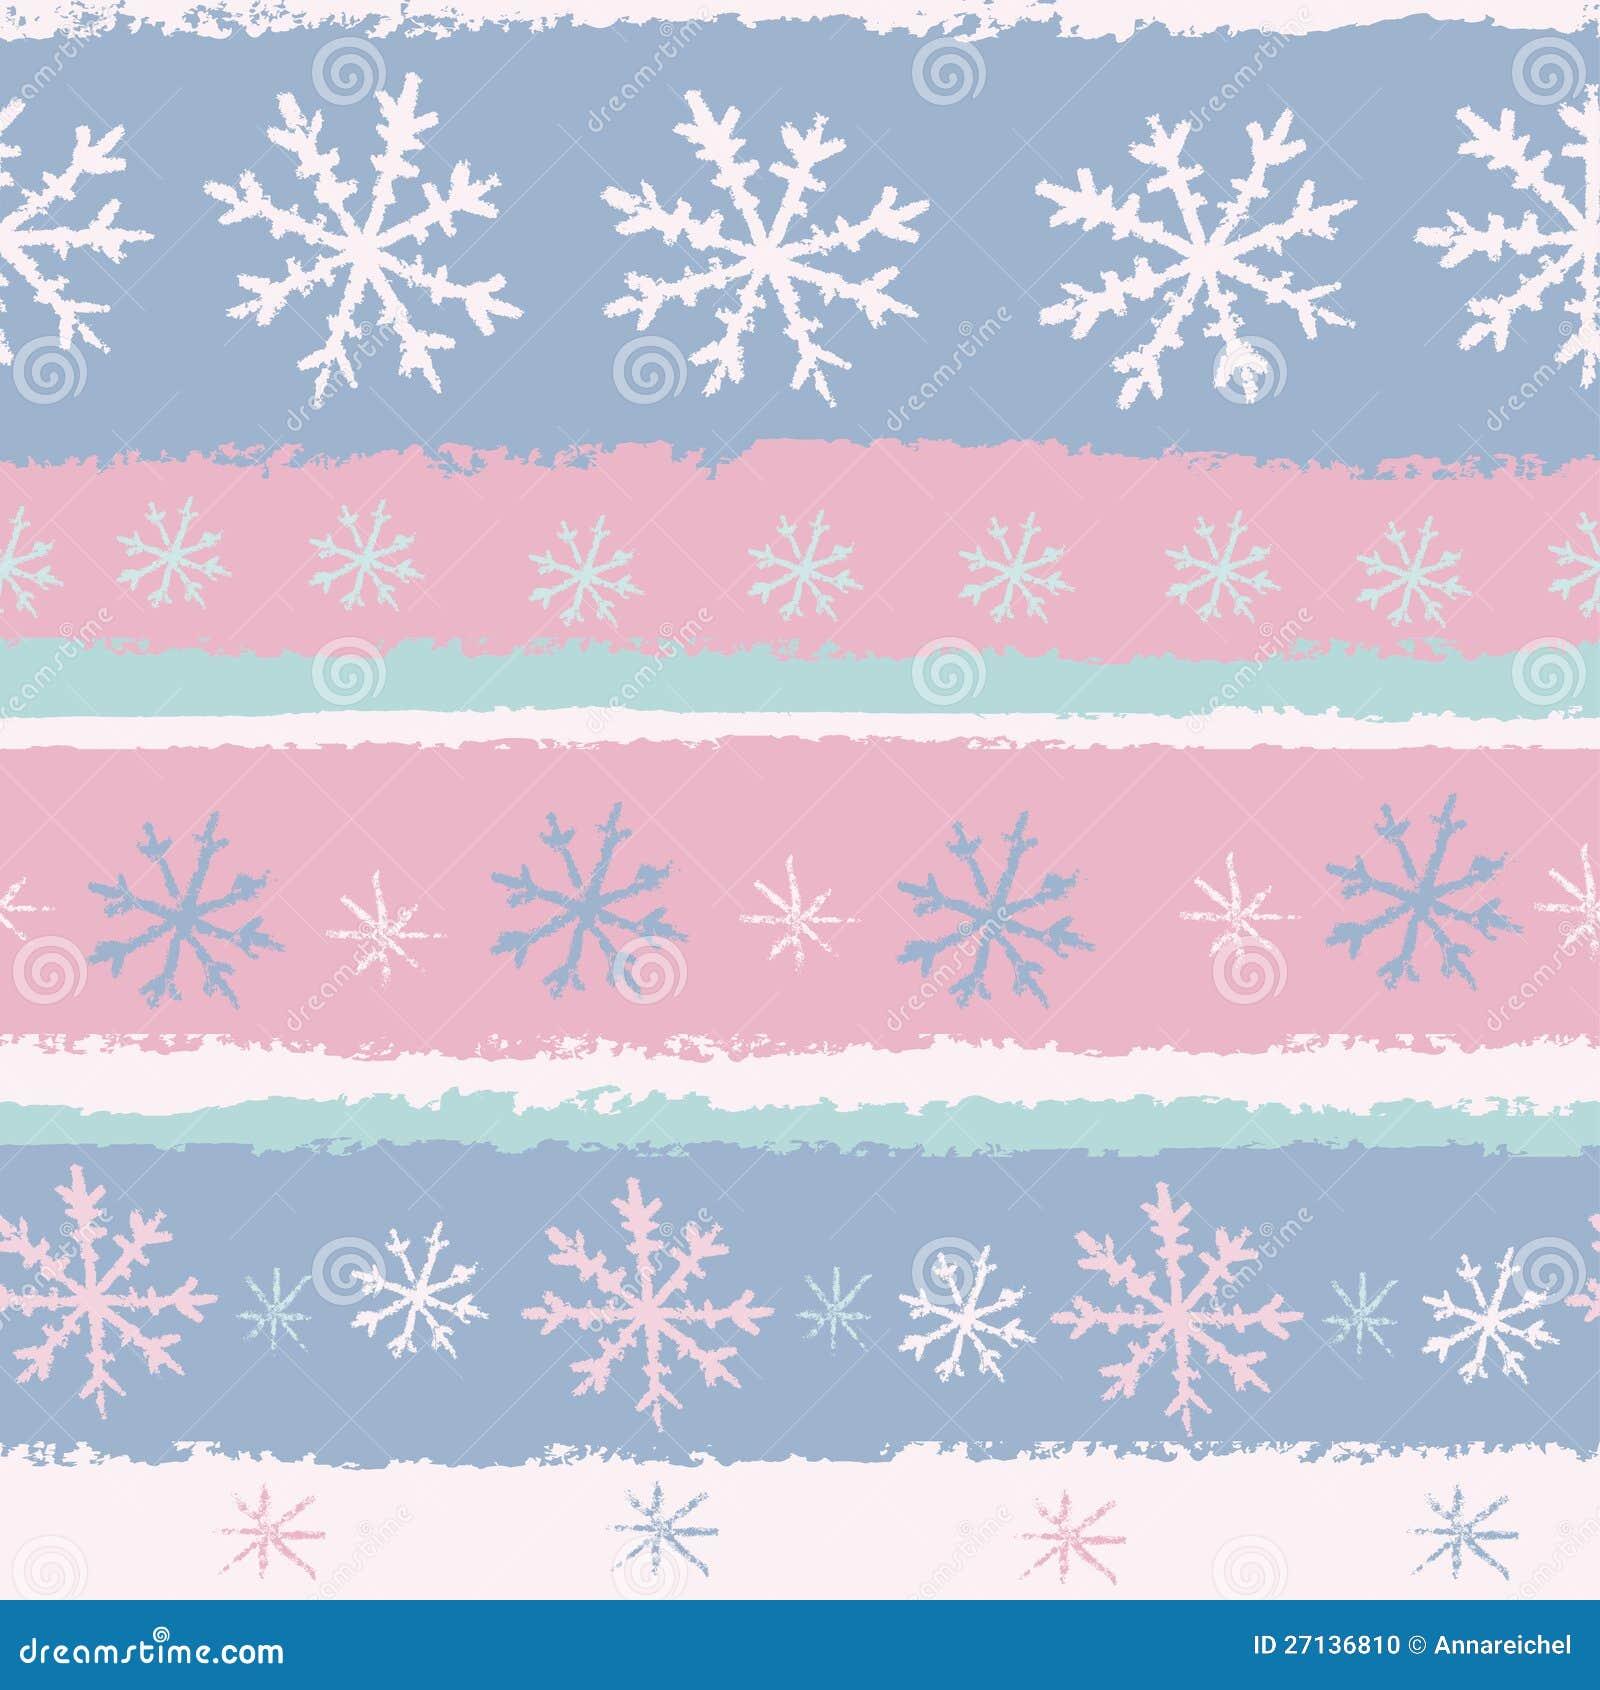 pastel snowflake wallpaper - photo #12